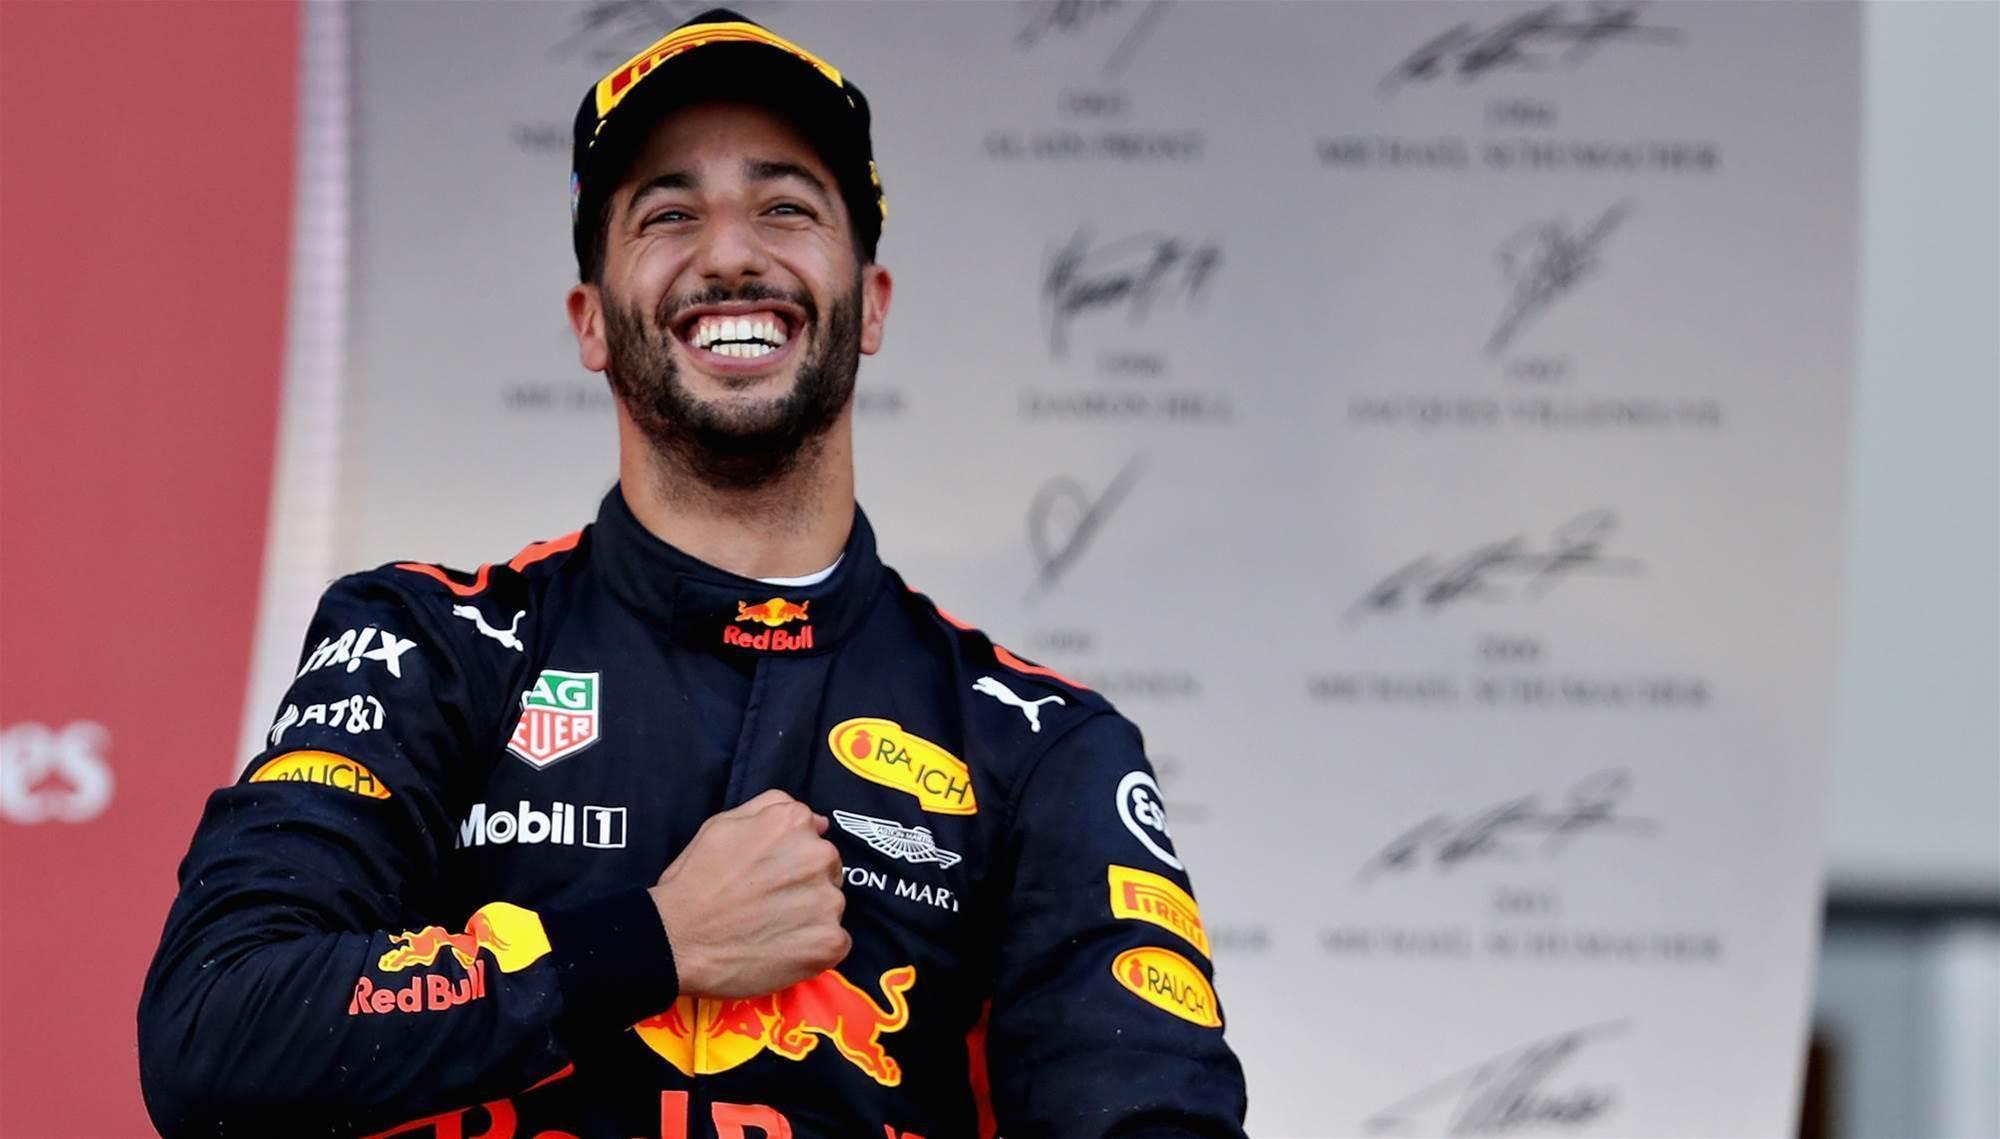 Gutsy Ricciardo overtake wins F1 'Pass of the Year'